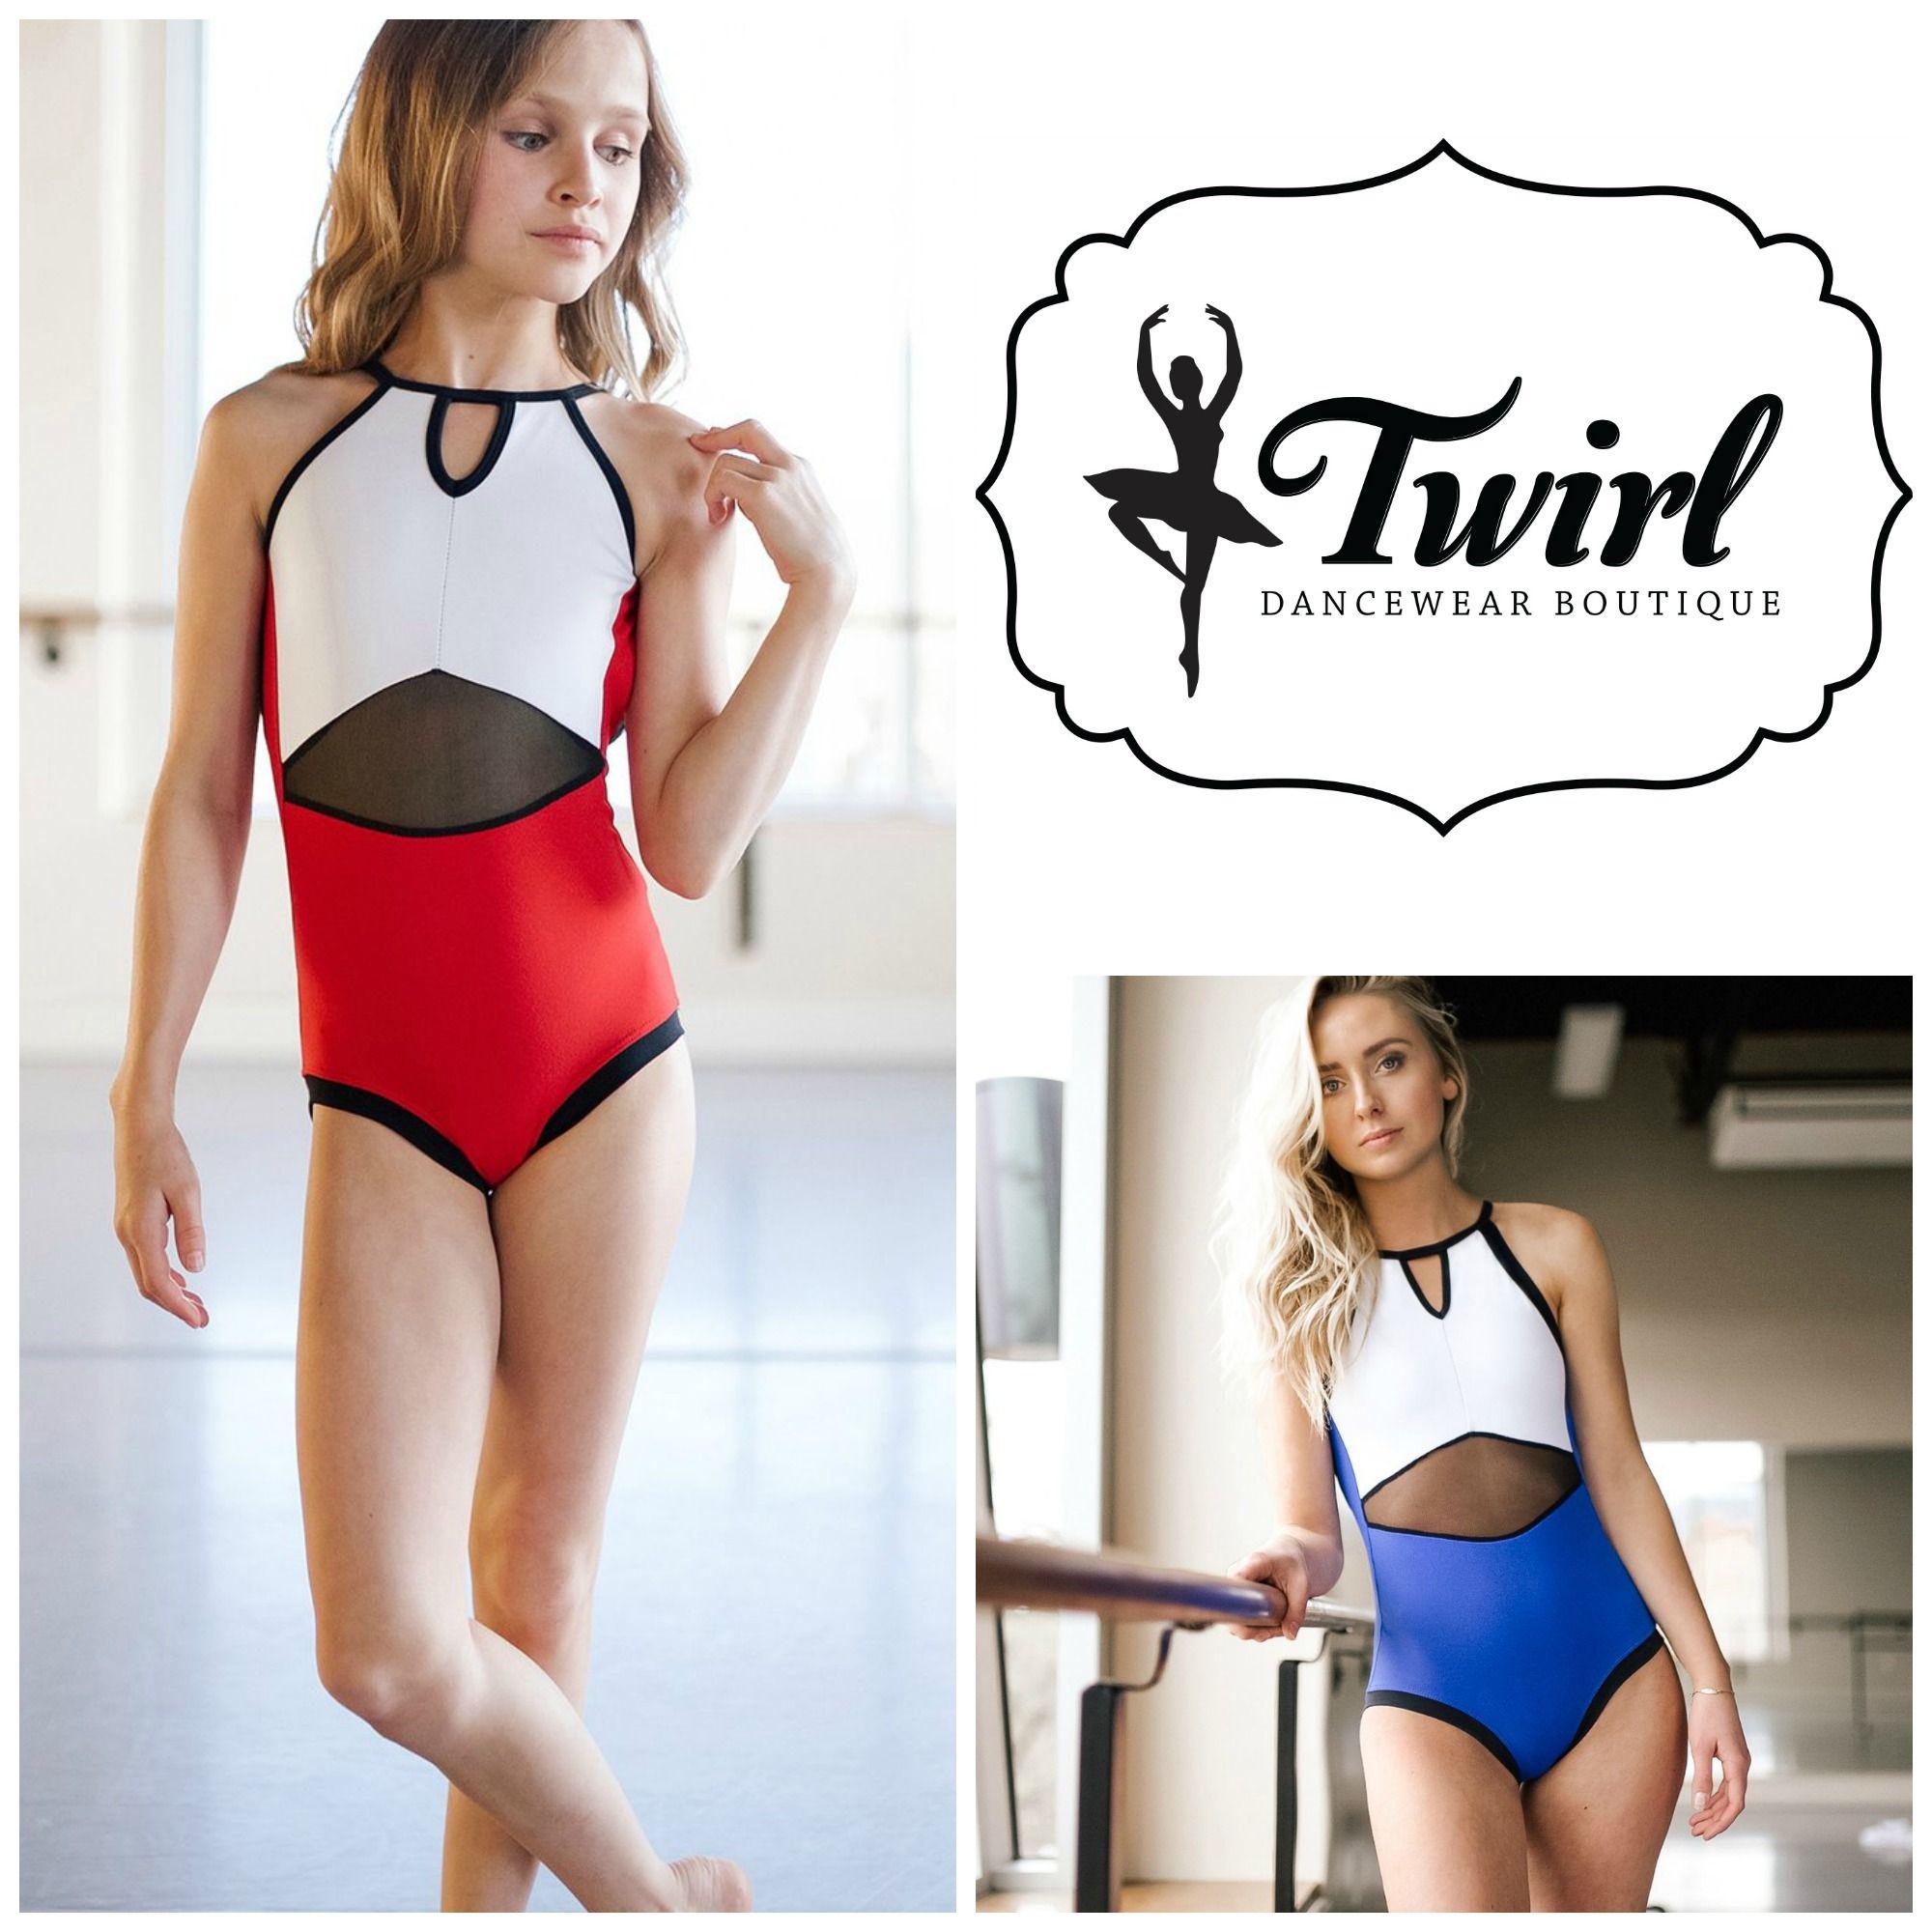 Kid Girl Sport Dance Outfits Two-Piece Jumpsuit Ballet Jazz Gymnastics Dancewear